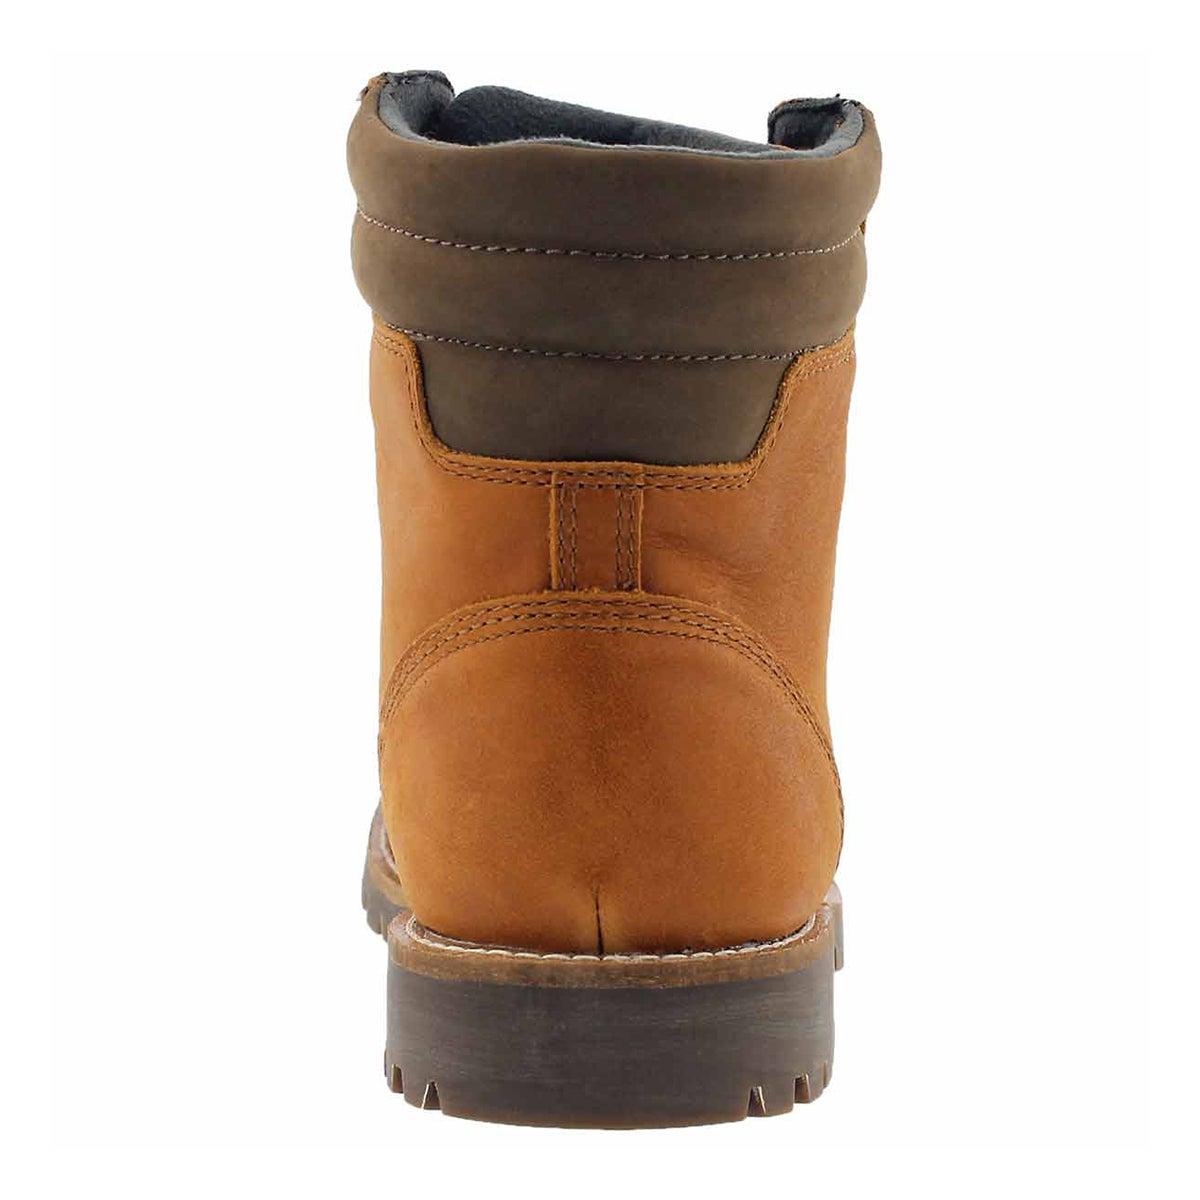 Mns Magog wtpf caramel ankle boot